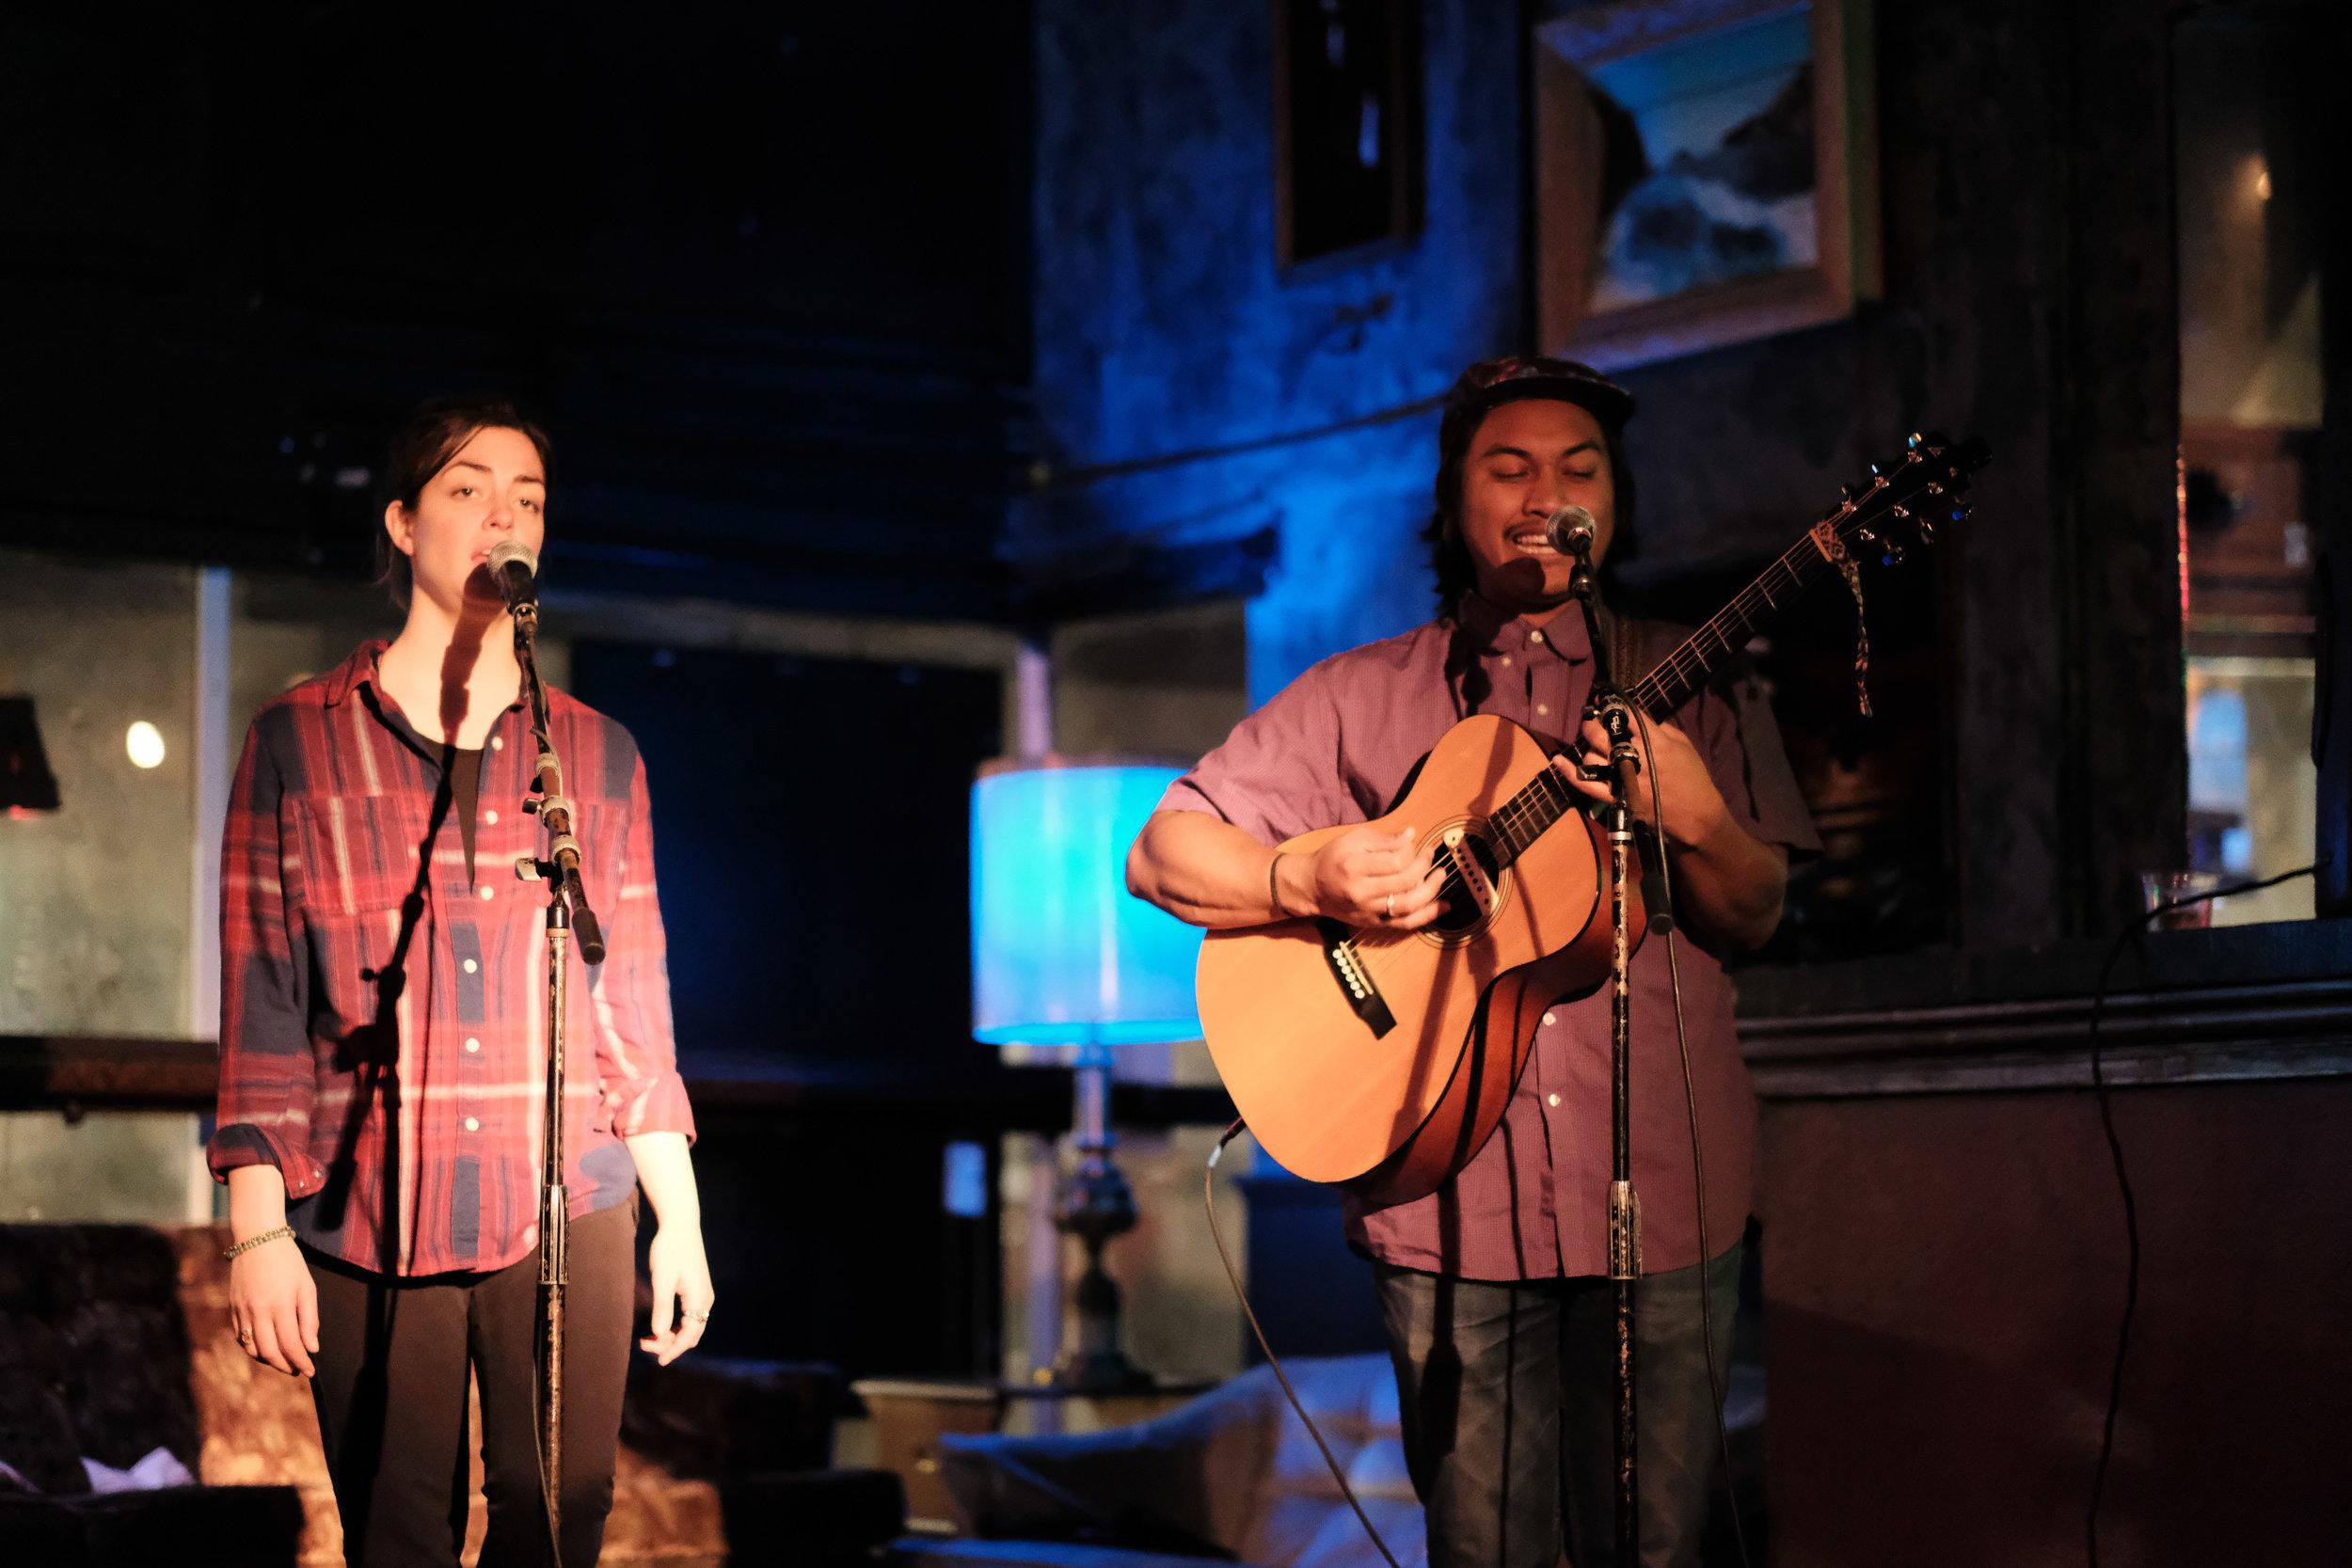 Young-Chhaylee and Hannah Abrams at Capitol Hill's Chop Suey, 21 November 2017.